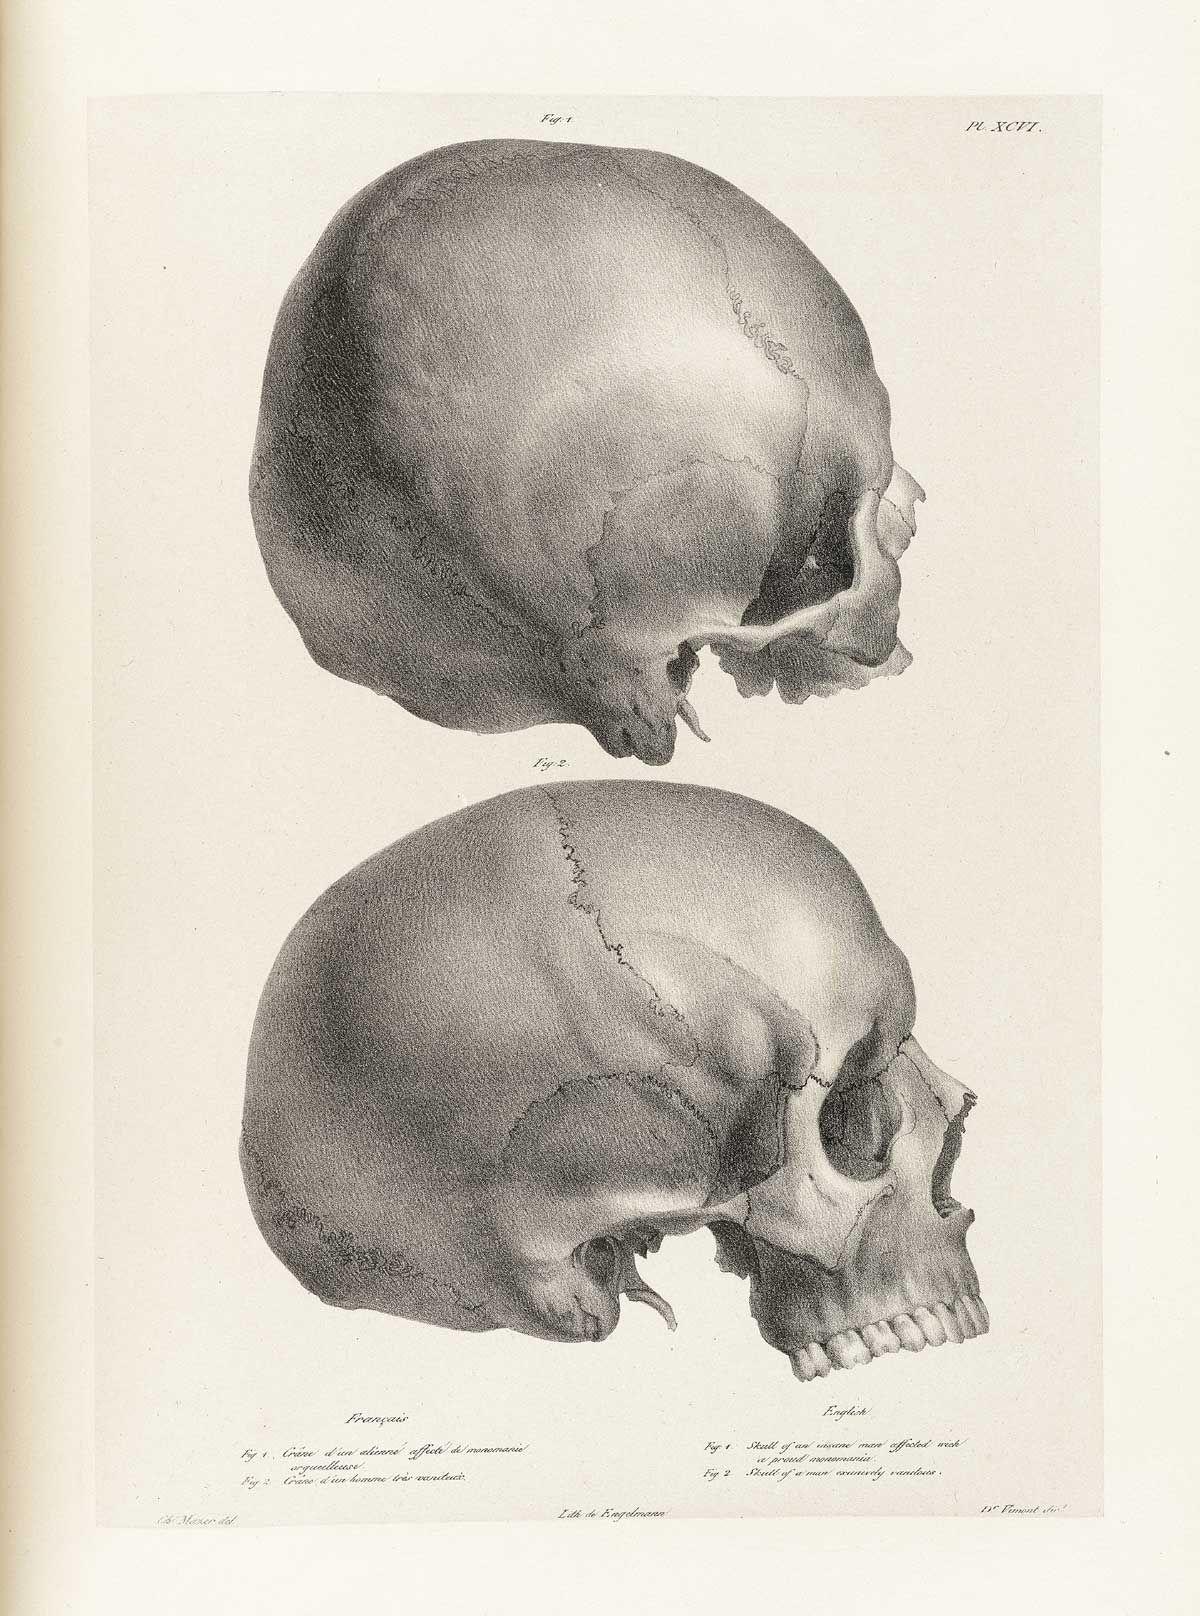 Pin by Mike Rickest Palos on Skull anatomy | Pinterest | Skull ...